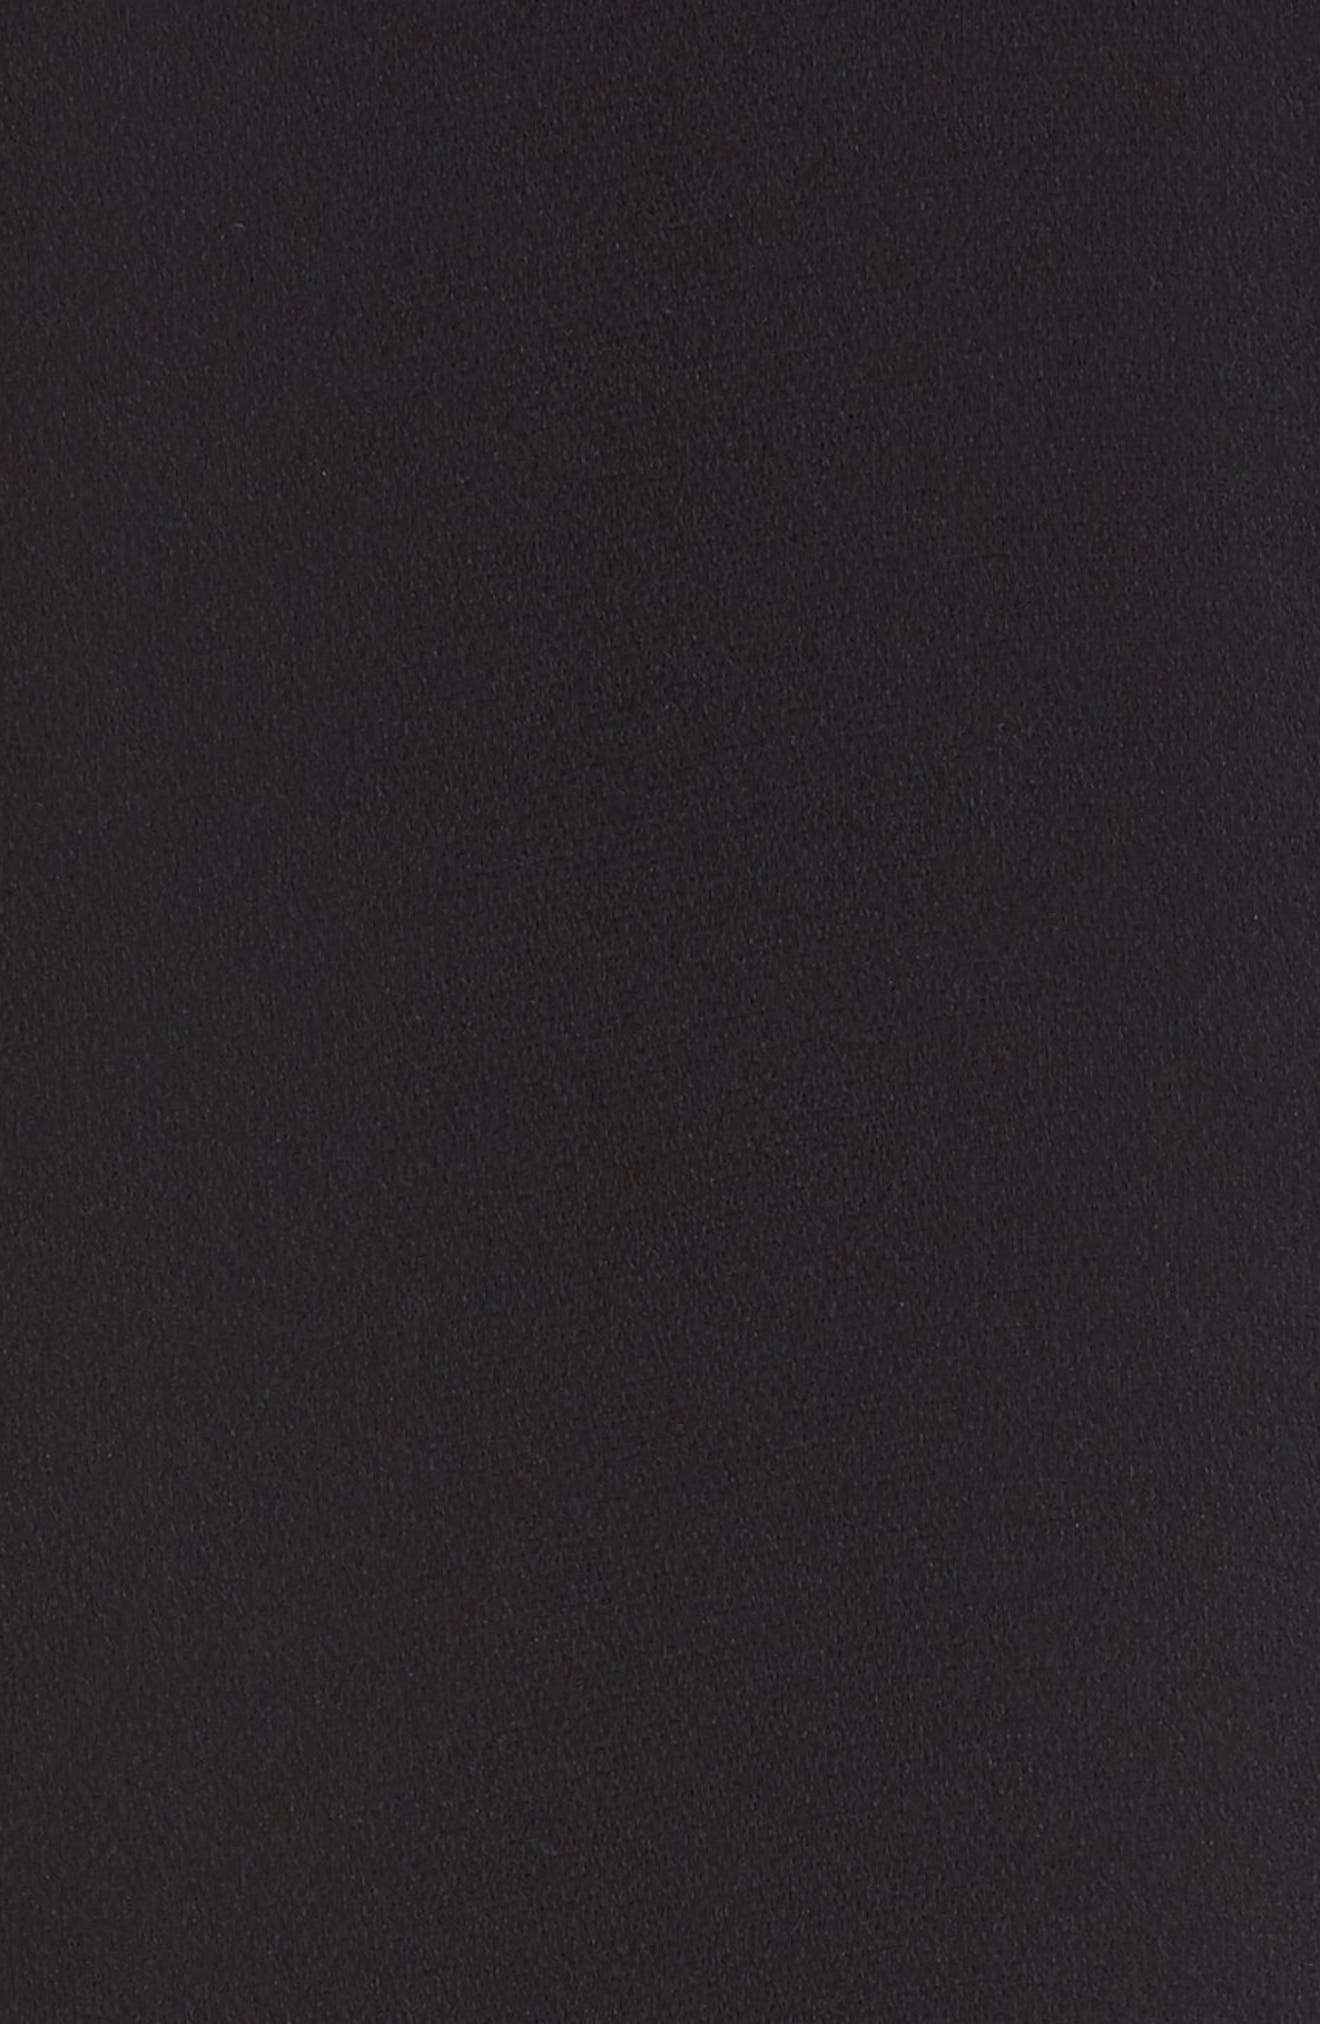 Sleeveless Maxi Dress,                             Alternate thumbnail 5, color,                             001